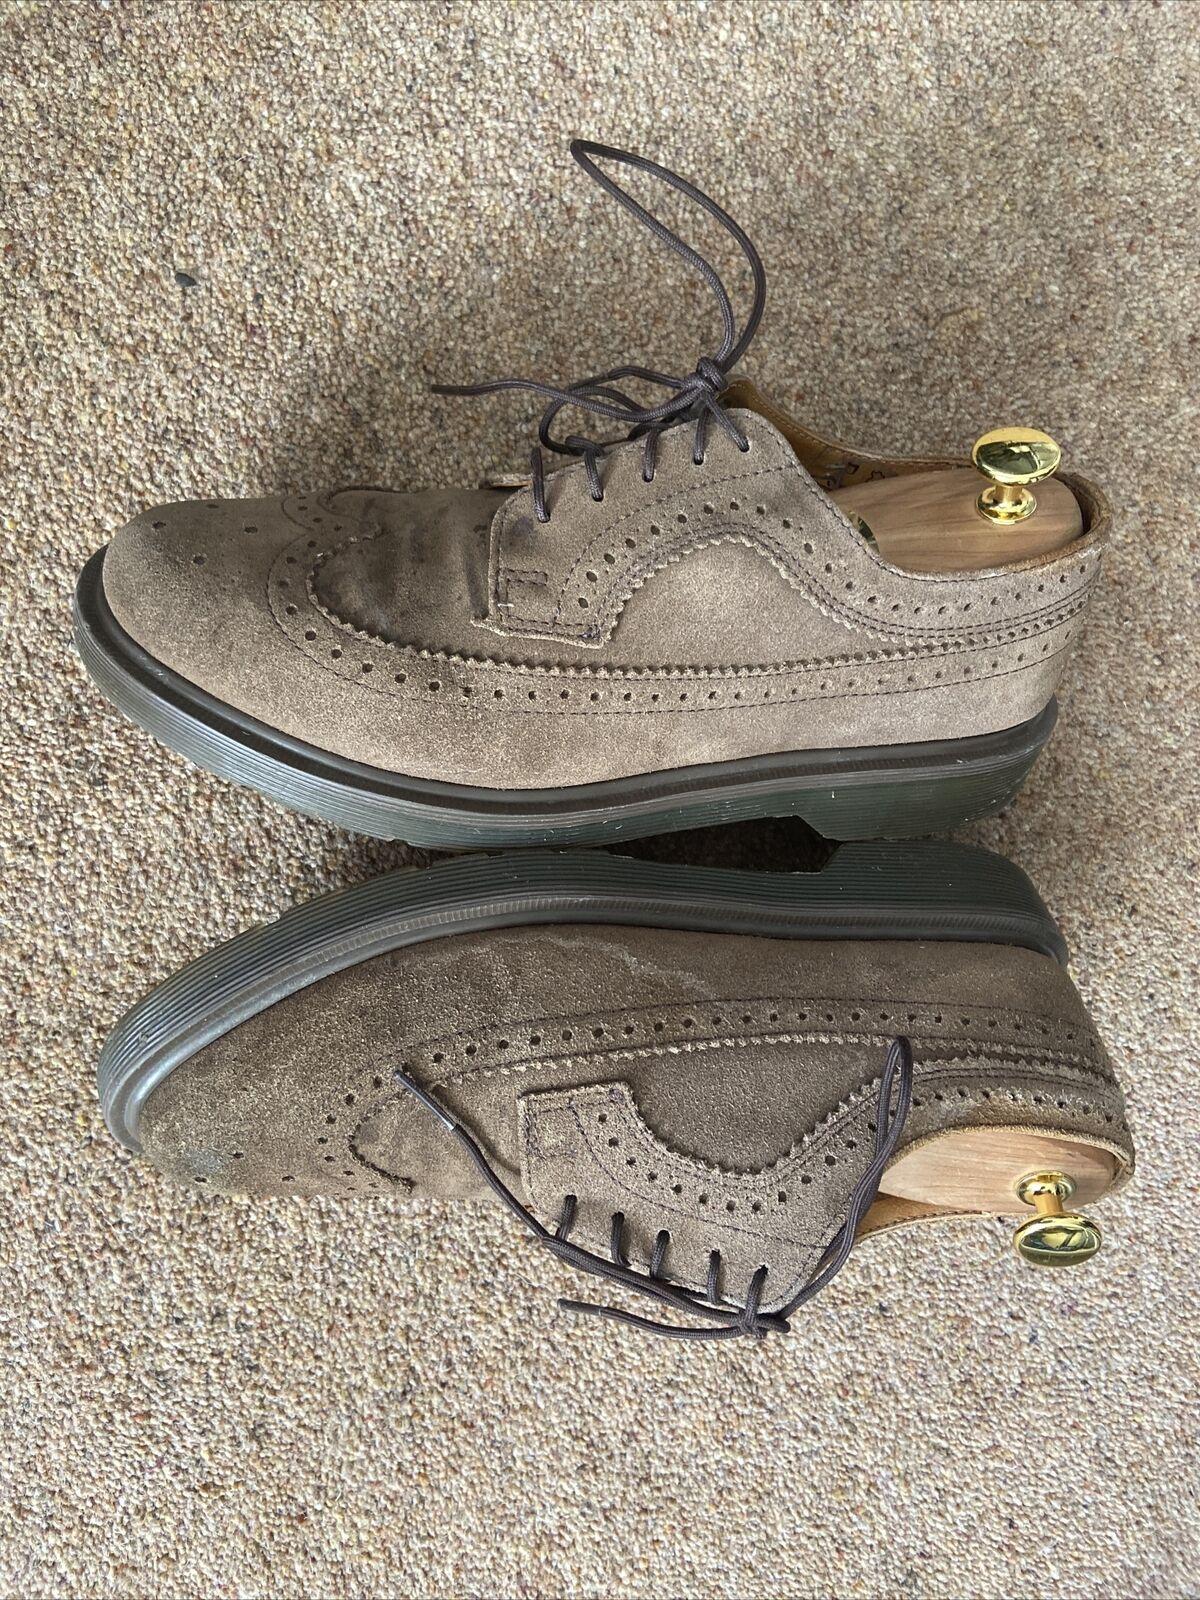 Dr. Martens Men's Oxfords Shoes Brown Lace Up Swede Low Top Size Uk 7